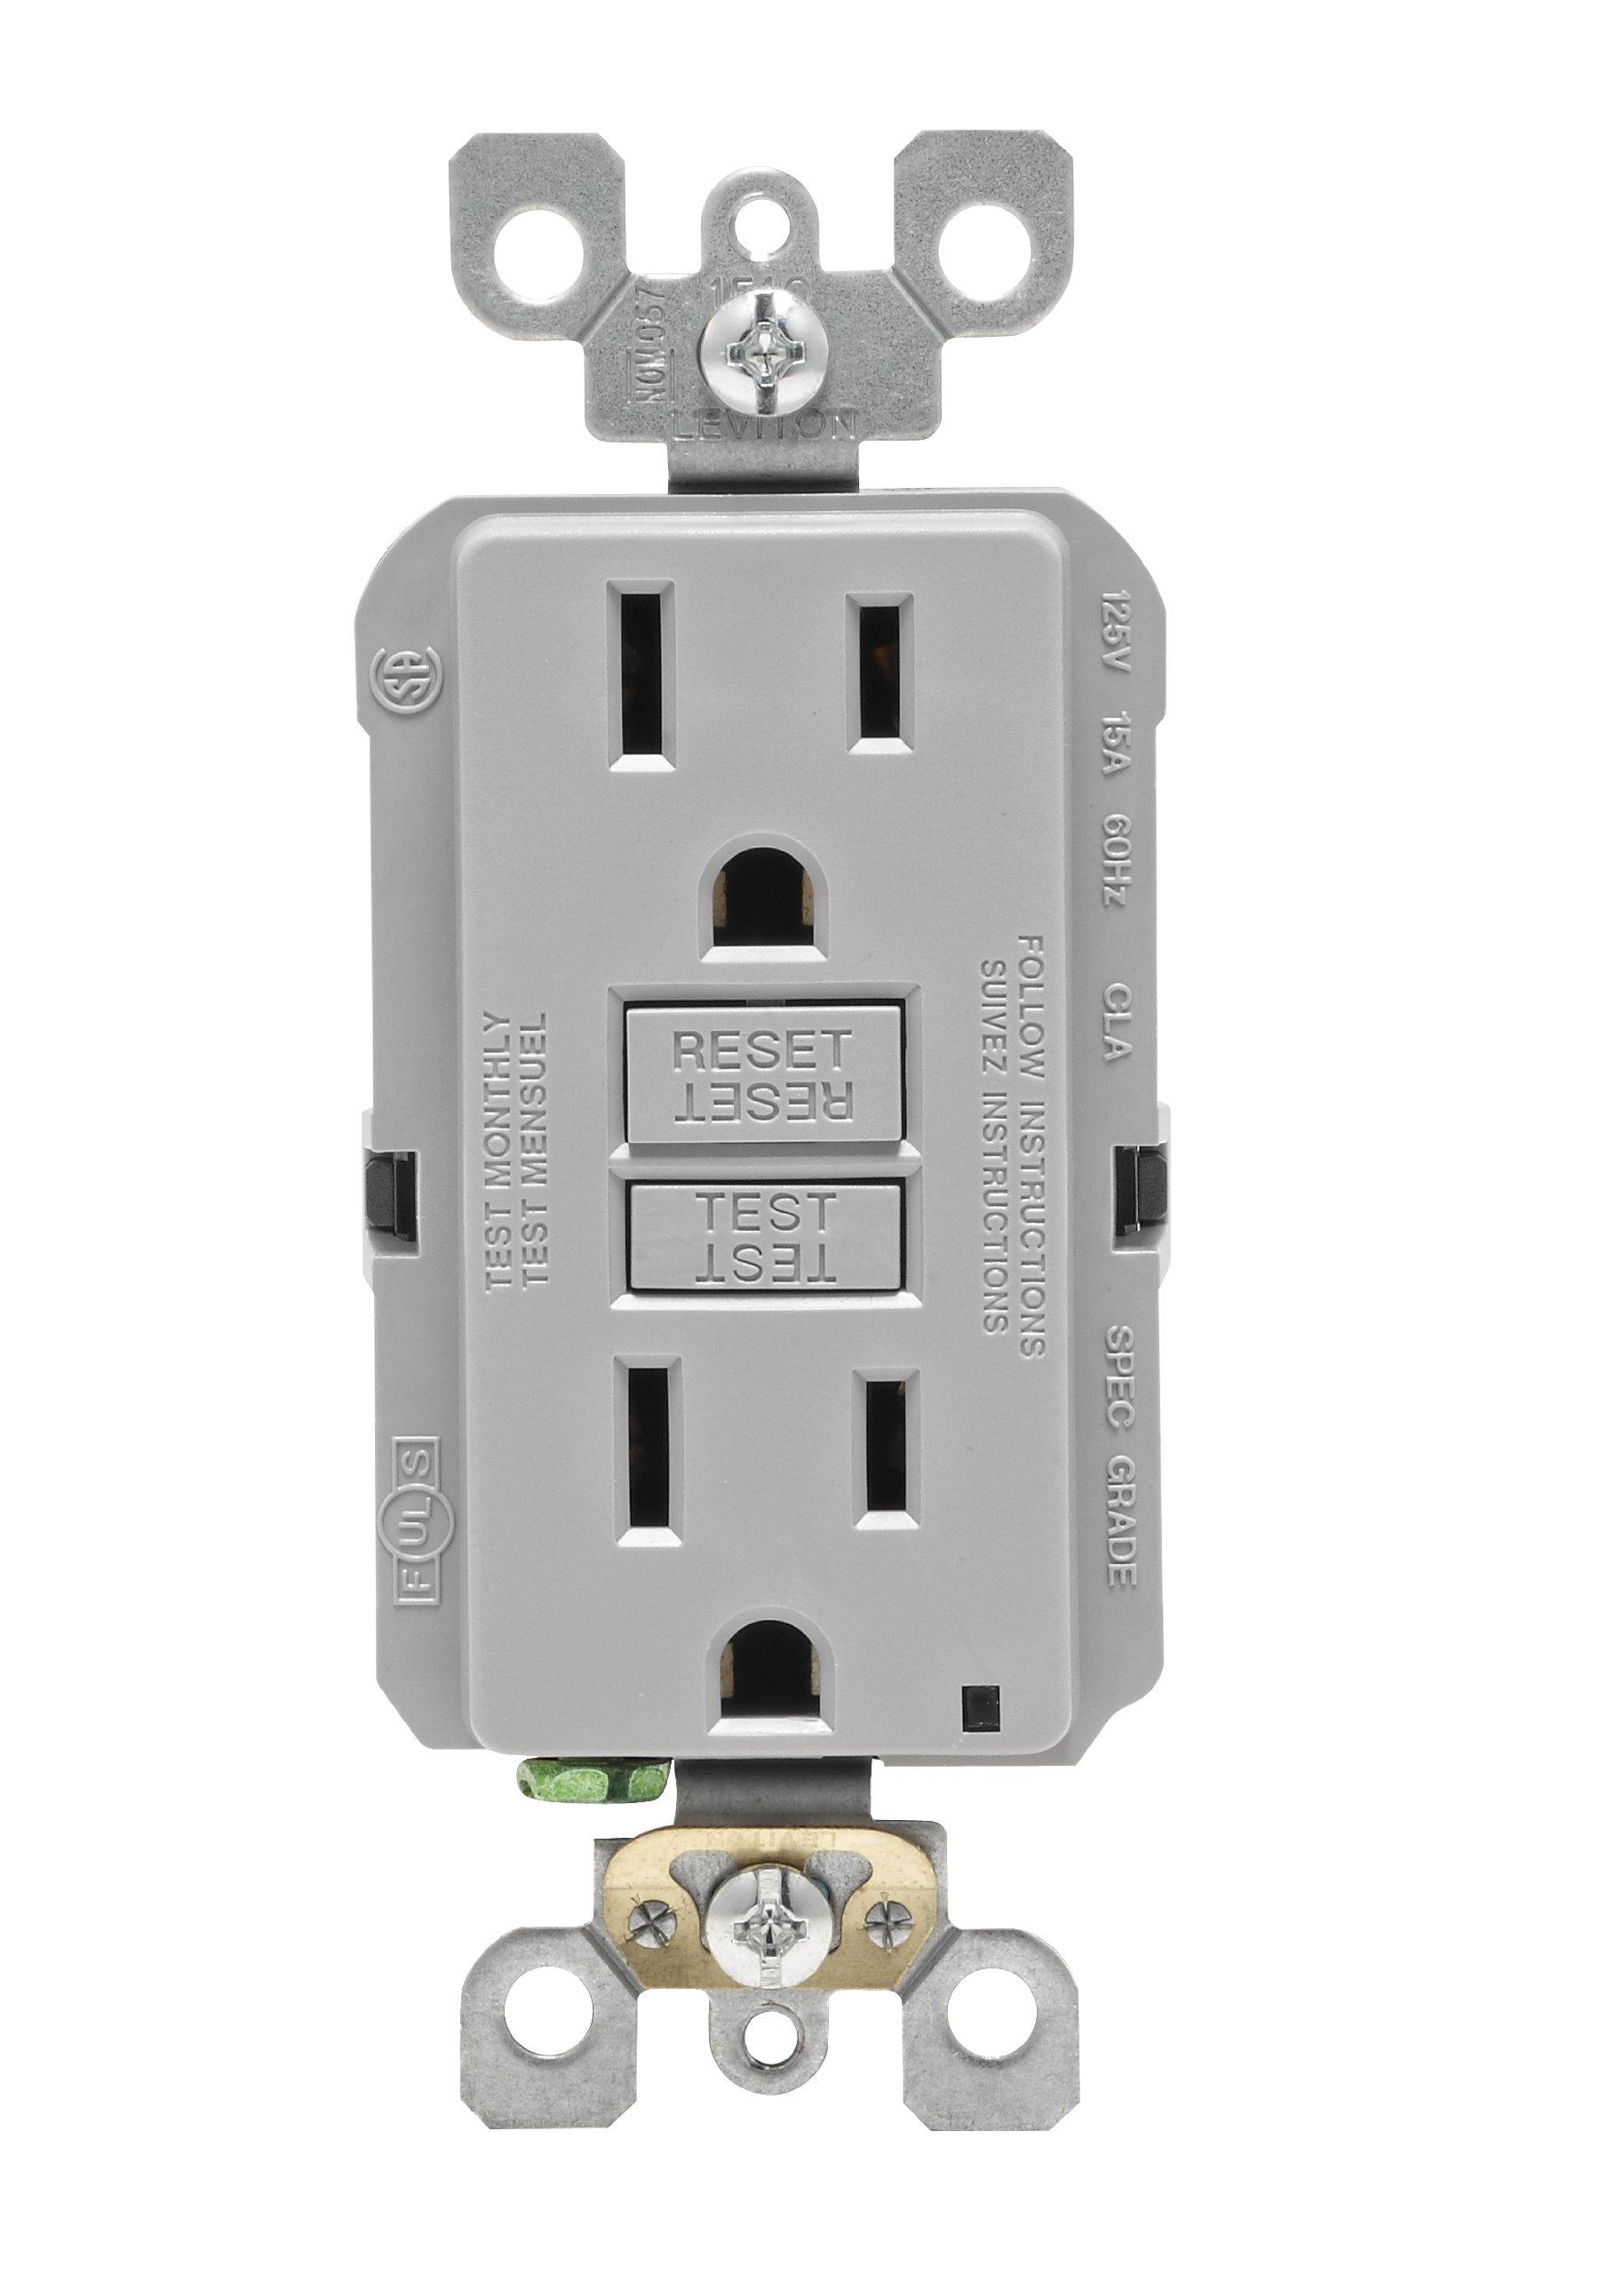 Leviton N7599-GY 15-Amp 125-volt Smart Lock Pro Slim Non-Tamper-Resistant Duplex GFCI Receptacle, Gray